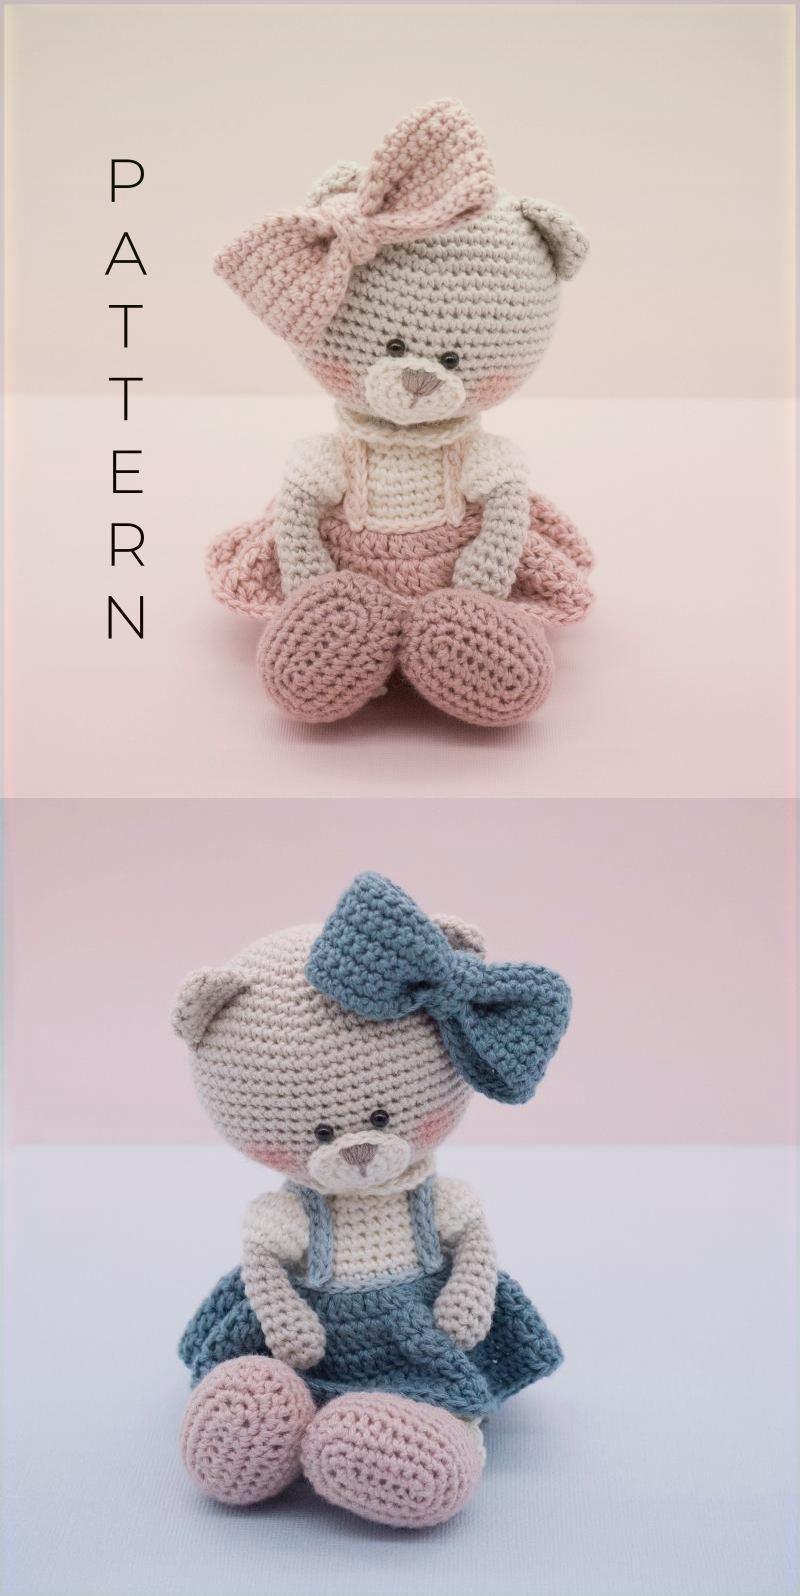 Amigurumi Crochet Pattern English Millie Rose The Teddy Bear